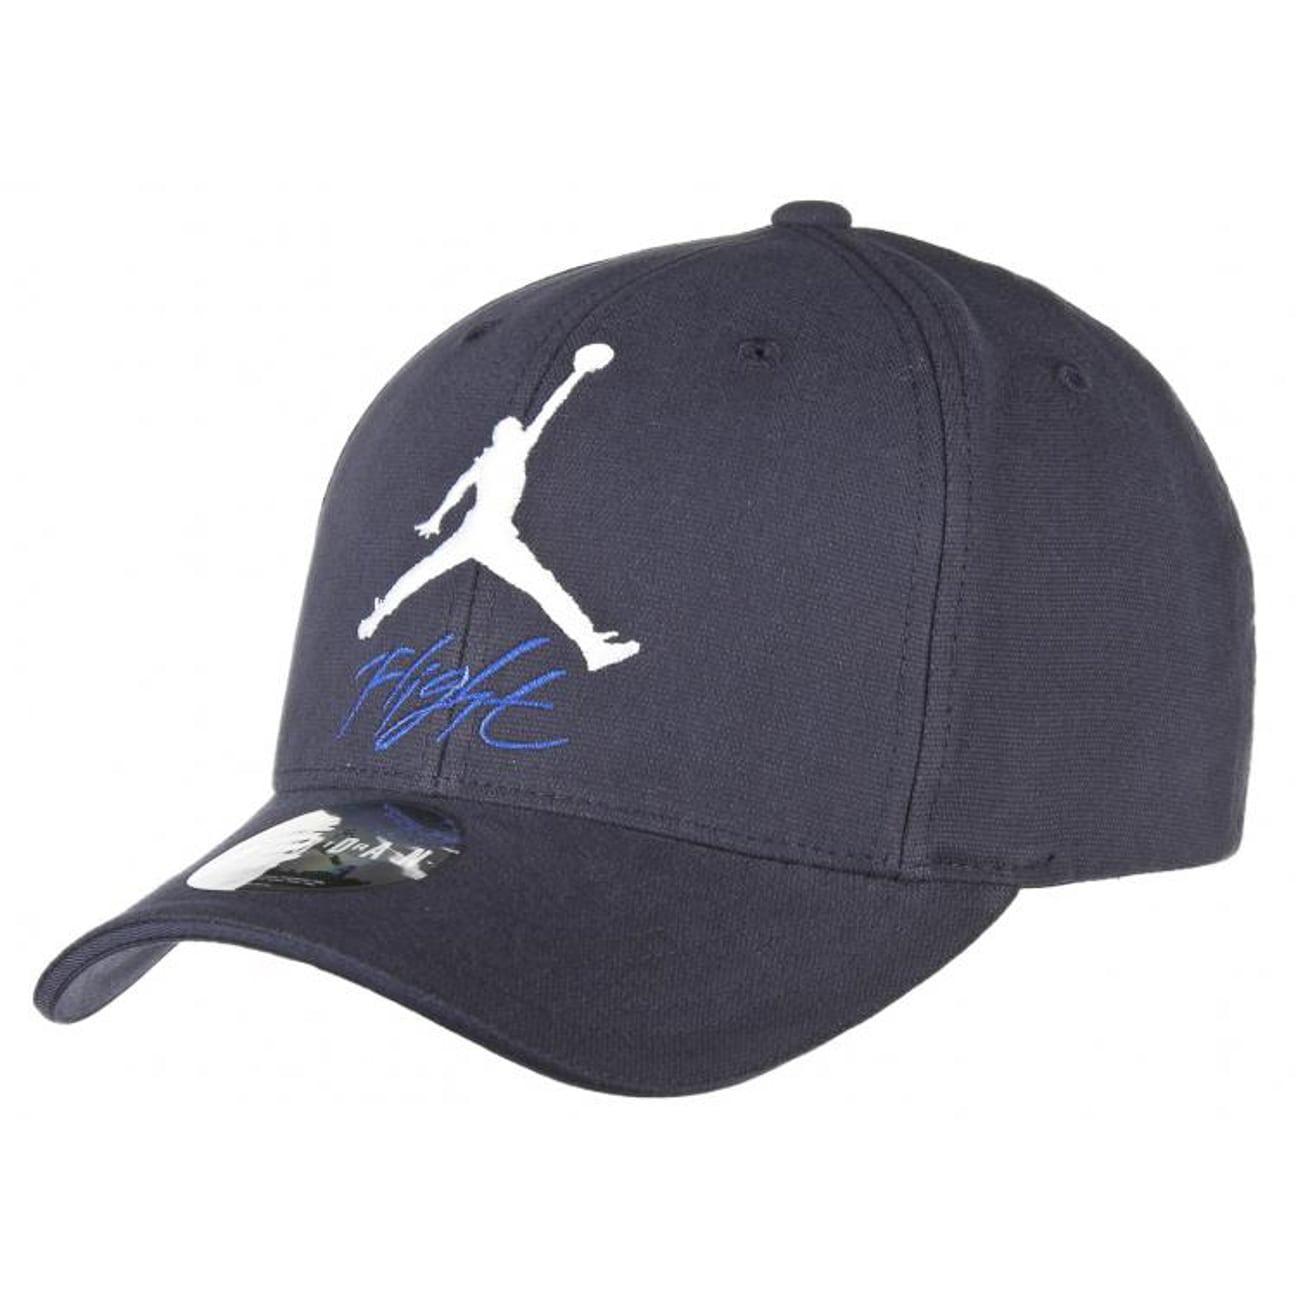 728975fa05acc Gorra de Béisbol Michael Jordan by Nike - Gorras - sombreroshop.es